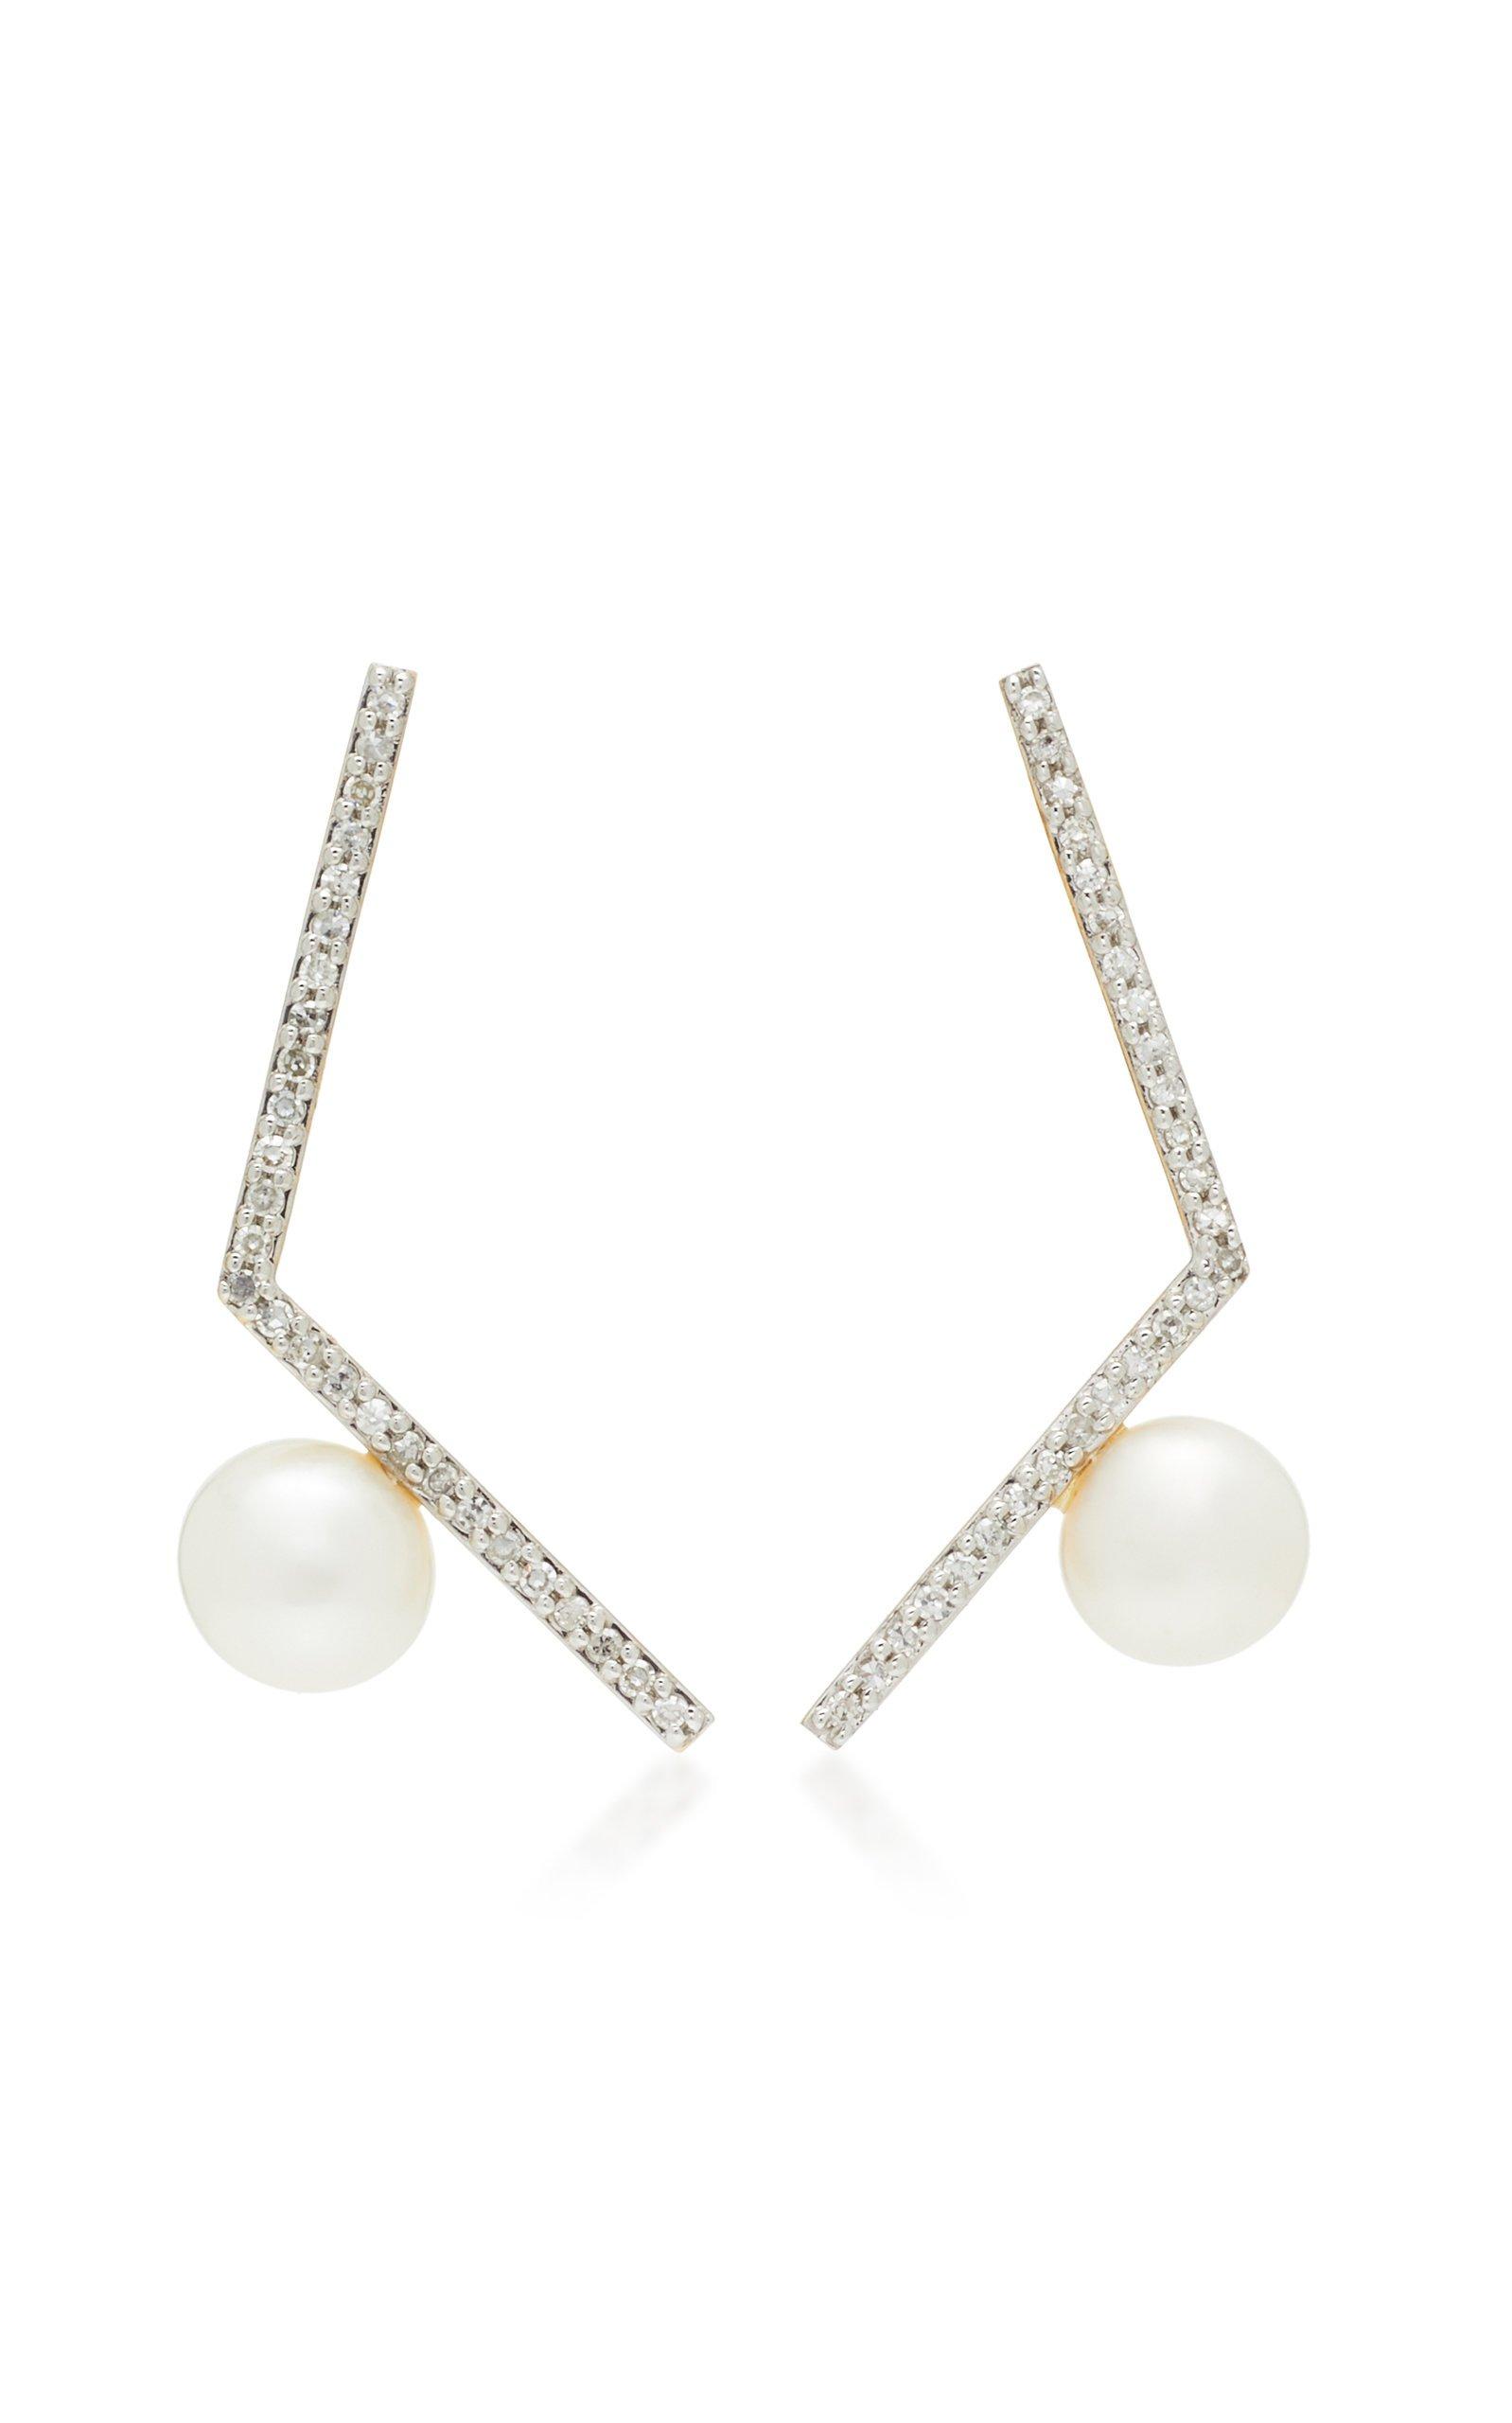 Mateo 14K White Gold Pearl Earrings